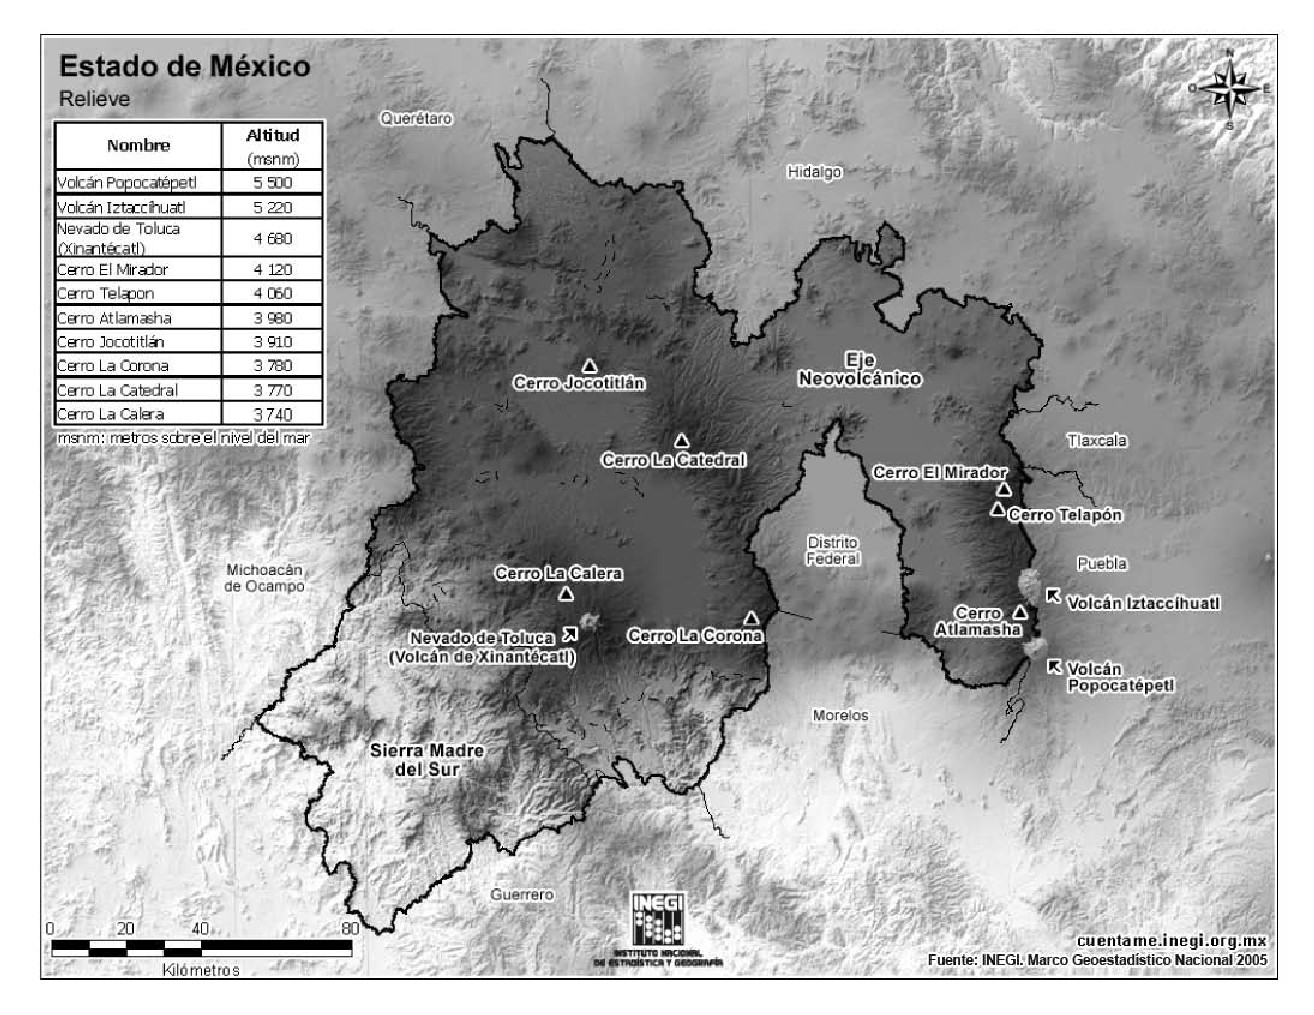 Mapa de montañas del Estado de México. INEGI de México